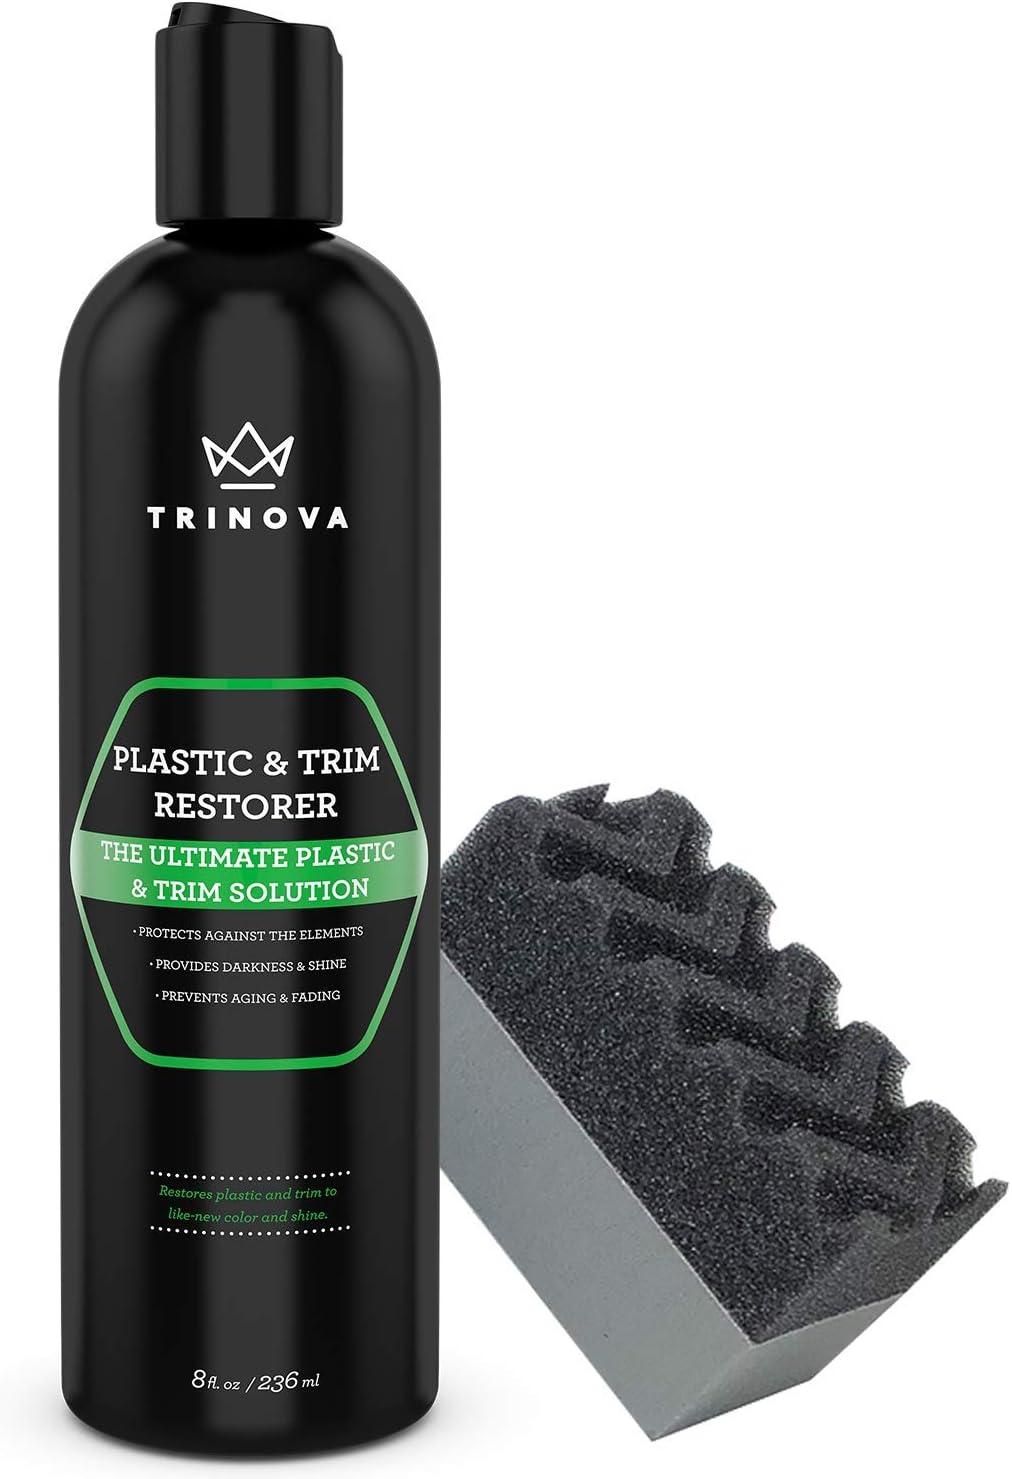 TriNnova Plastic and Trim Restorer